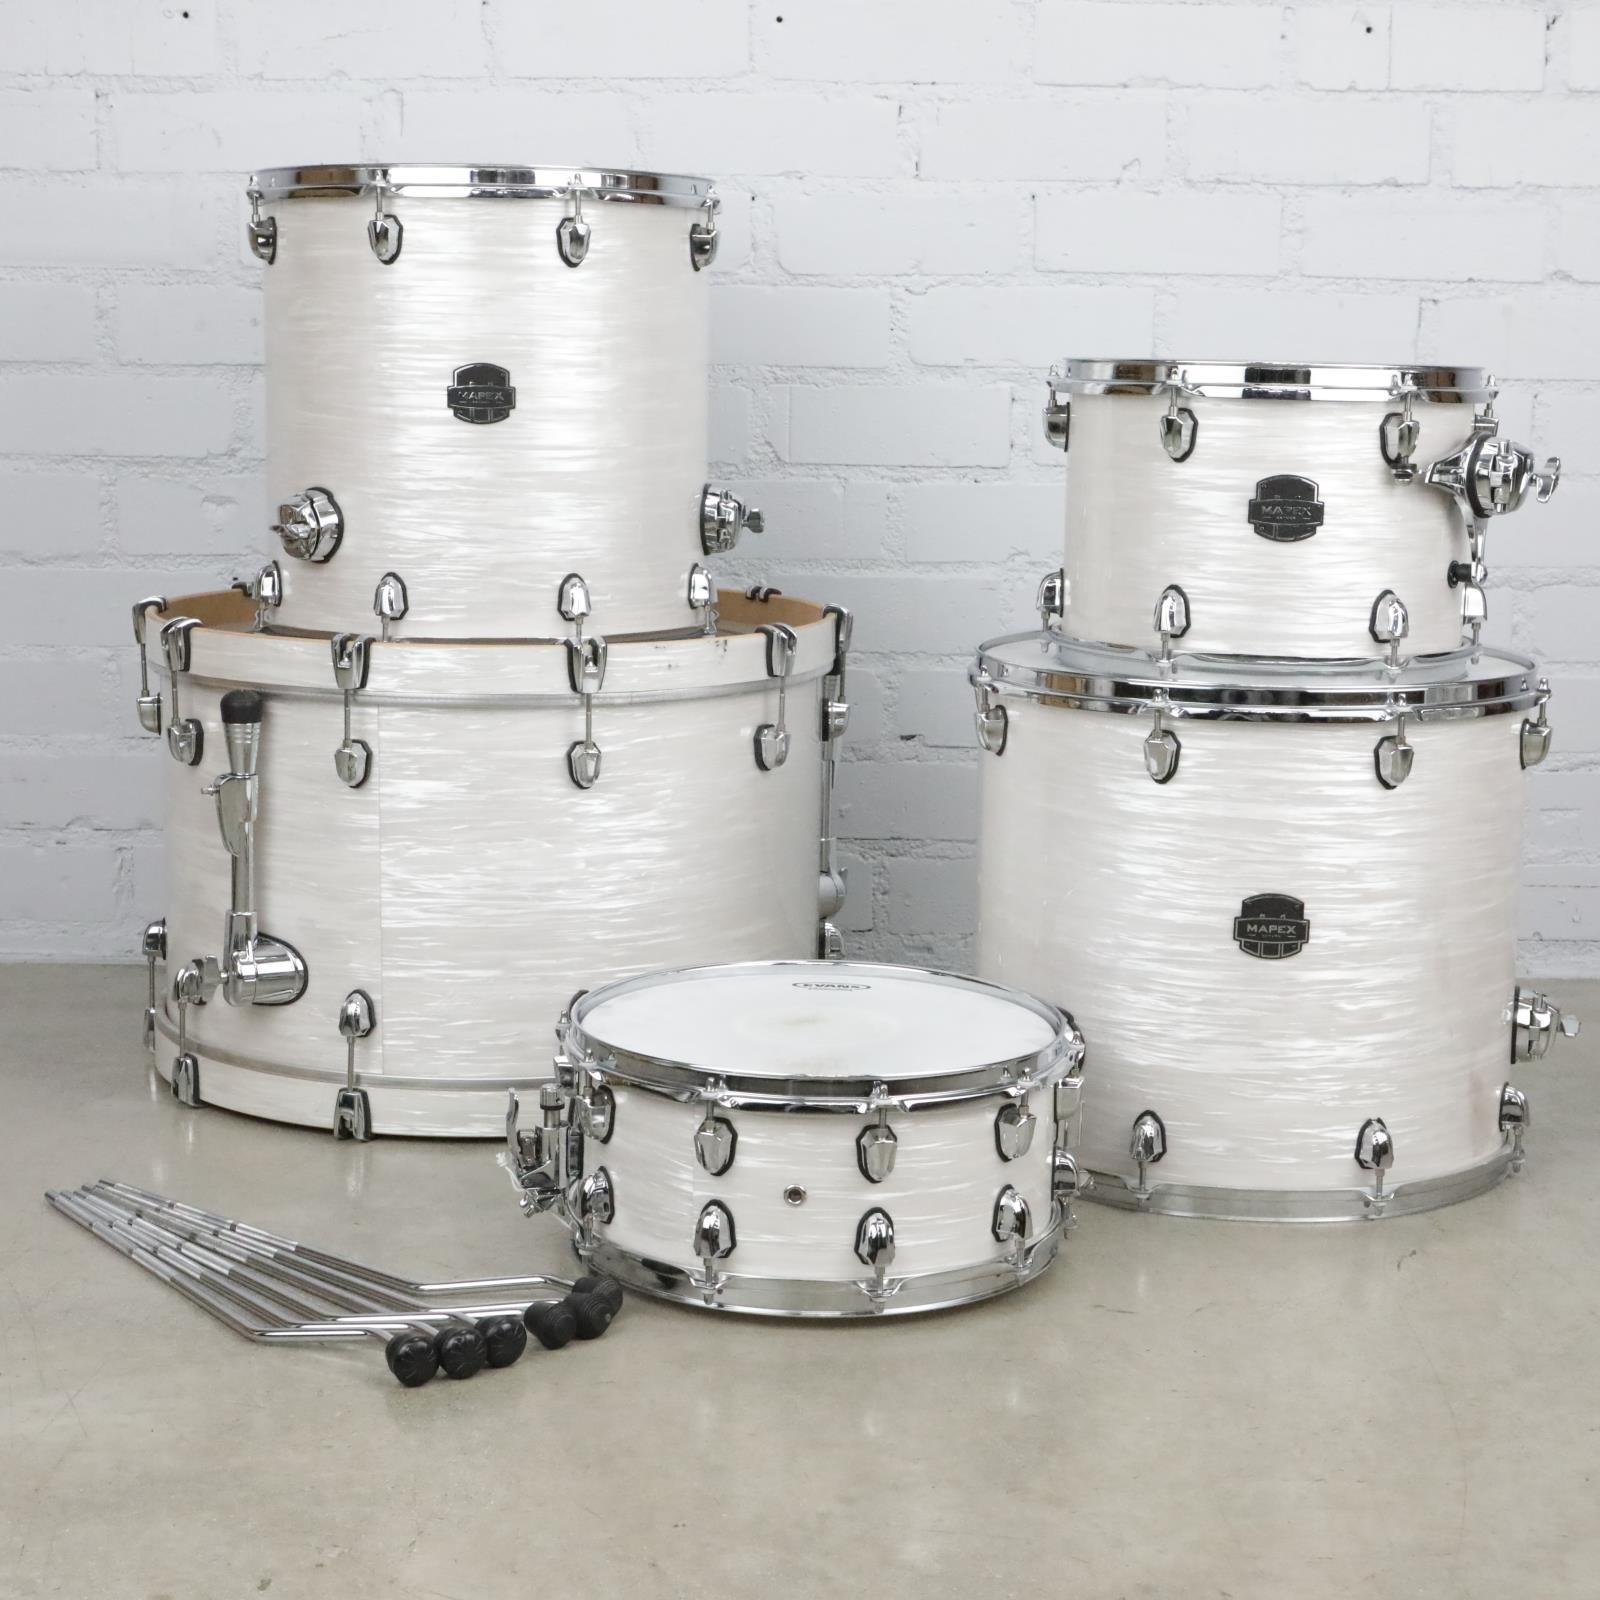 Mapex Saturn Series 5pc White Ribbon Marine Pearl Drum Set #41080